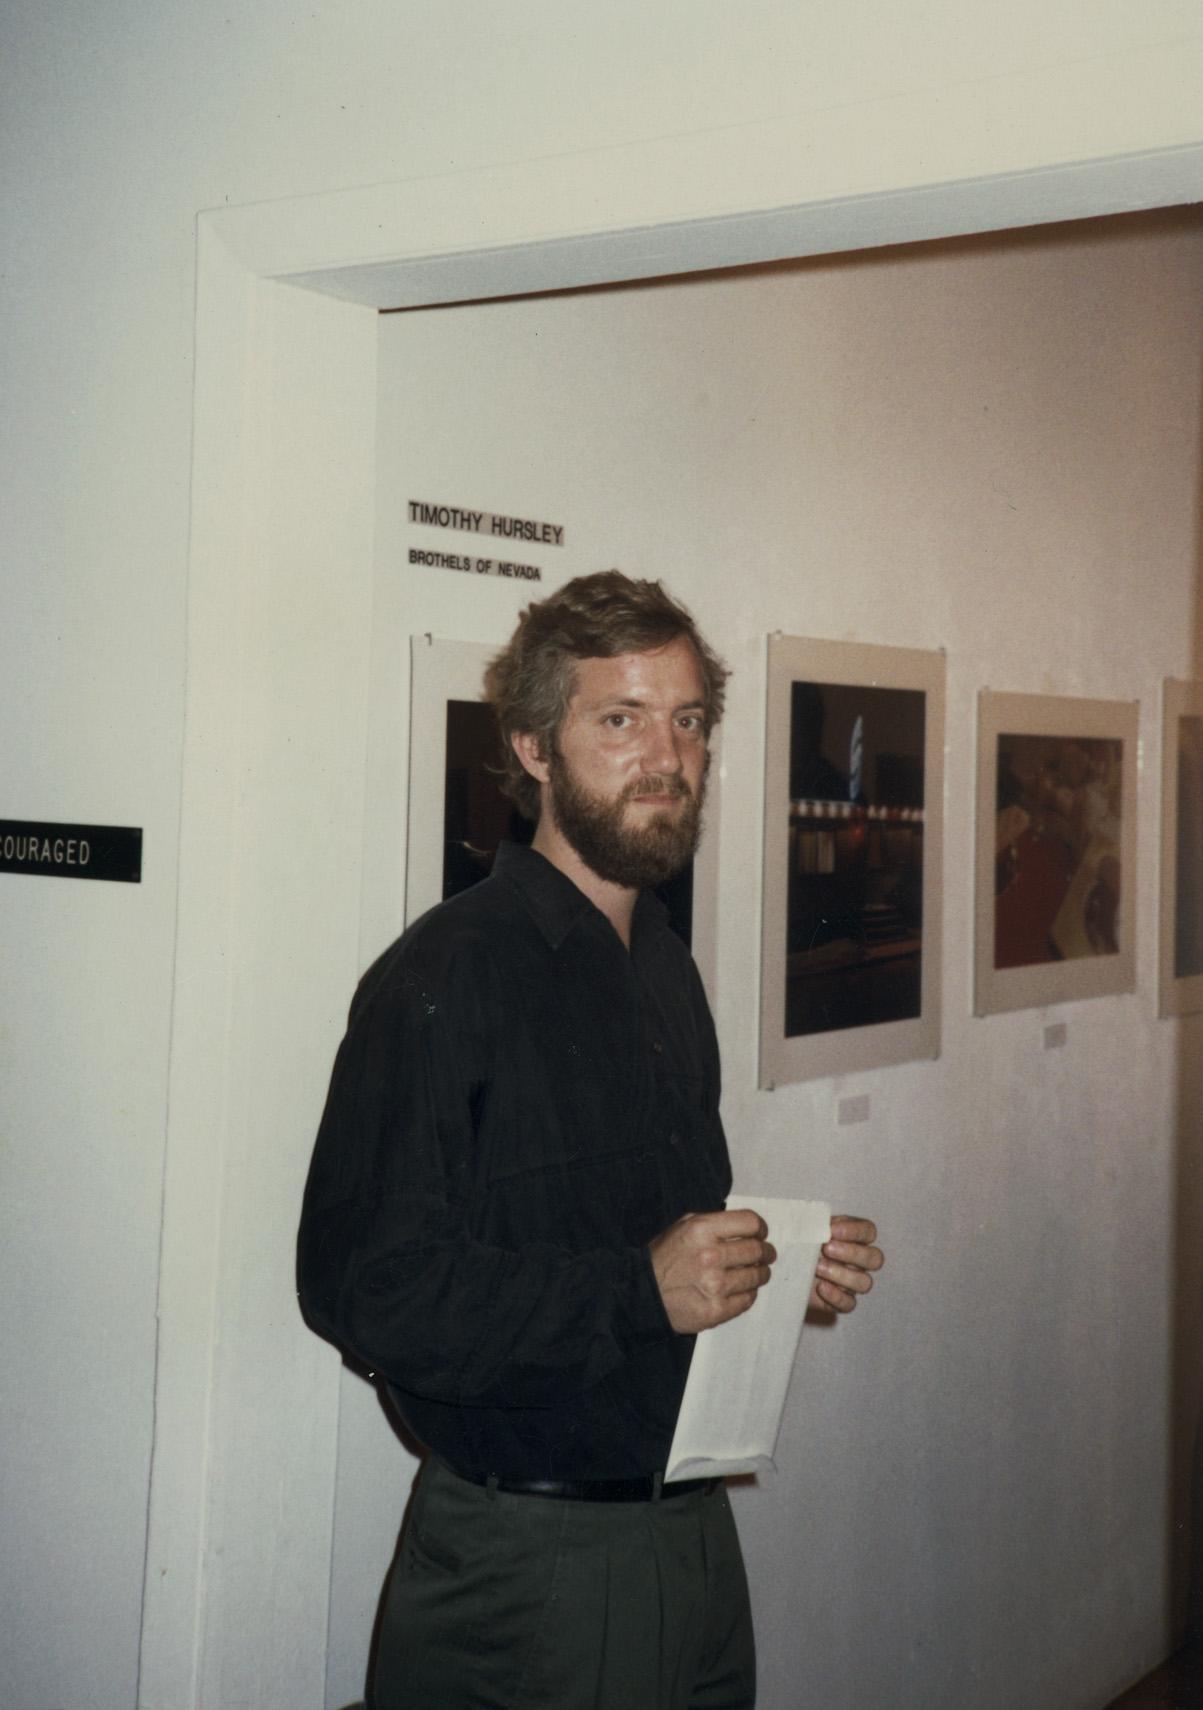 Hursley at OK Harris Gallery with Ivan Karp 1990